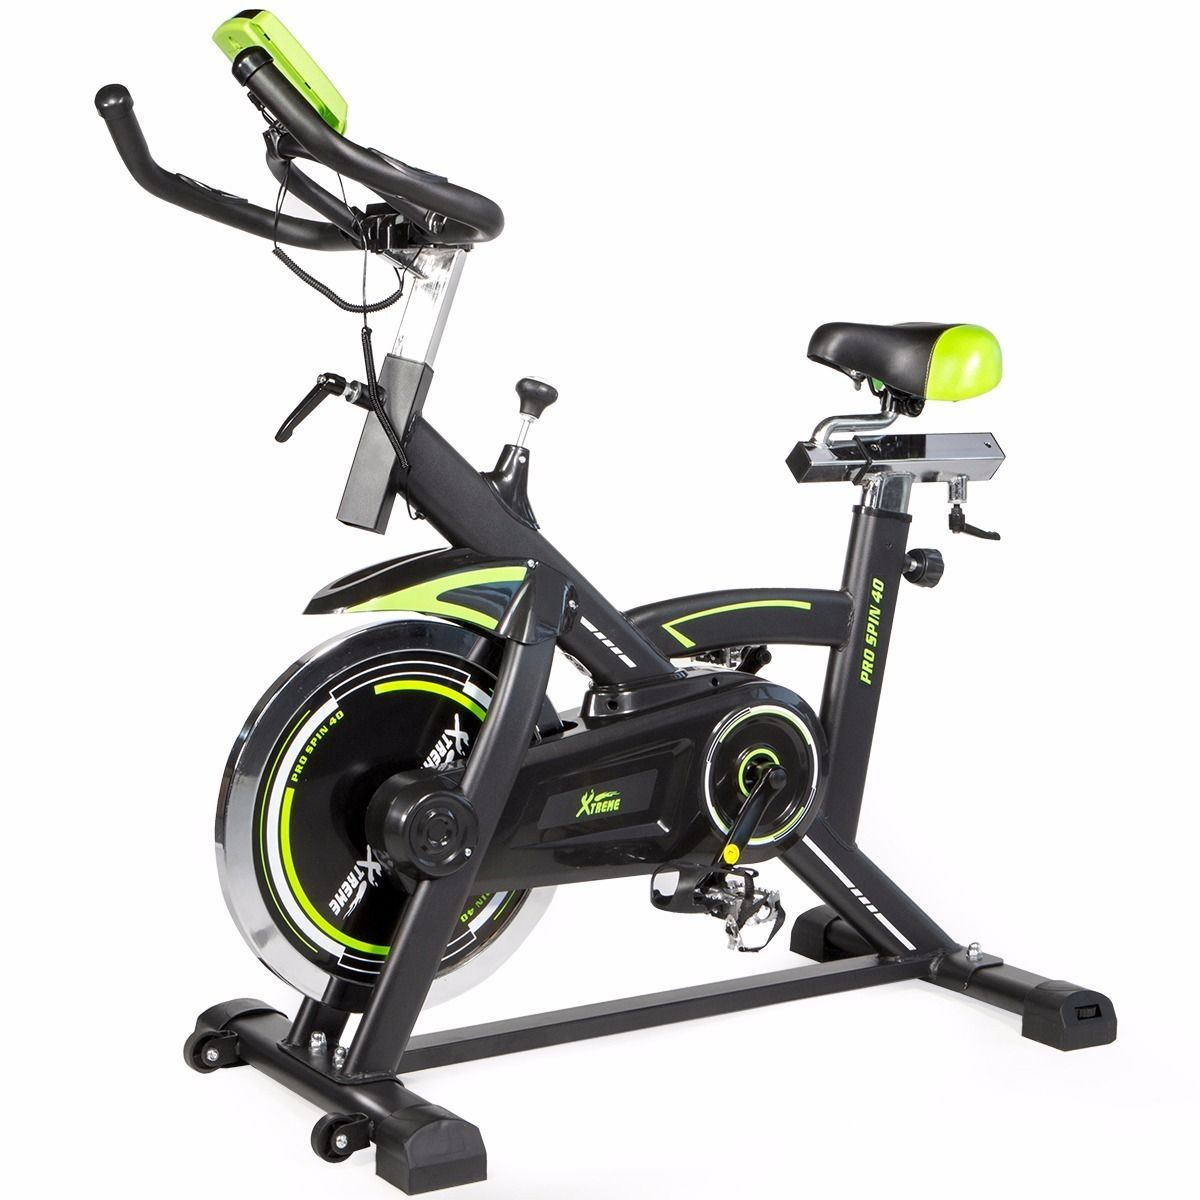 Pro Fitness Stationary Spinning Exercise Bike Cardio Indoor